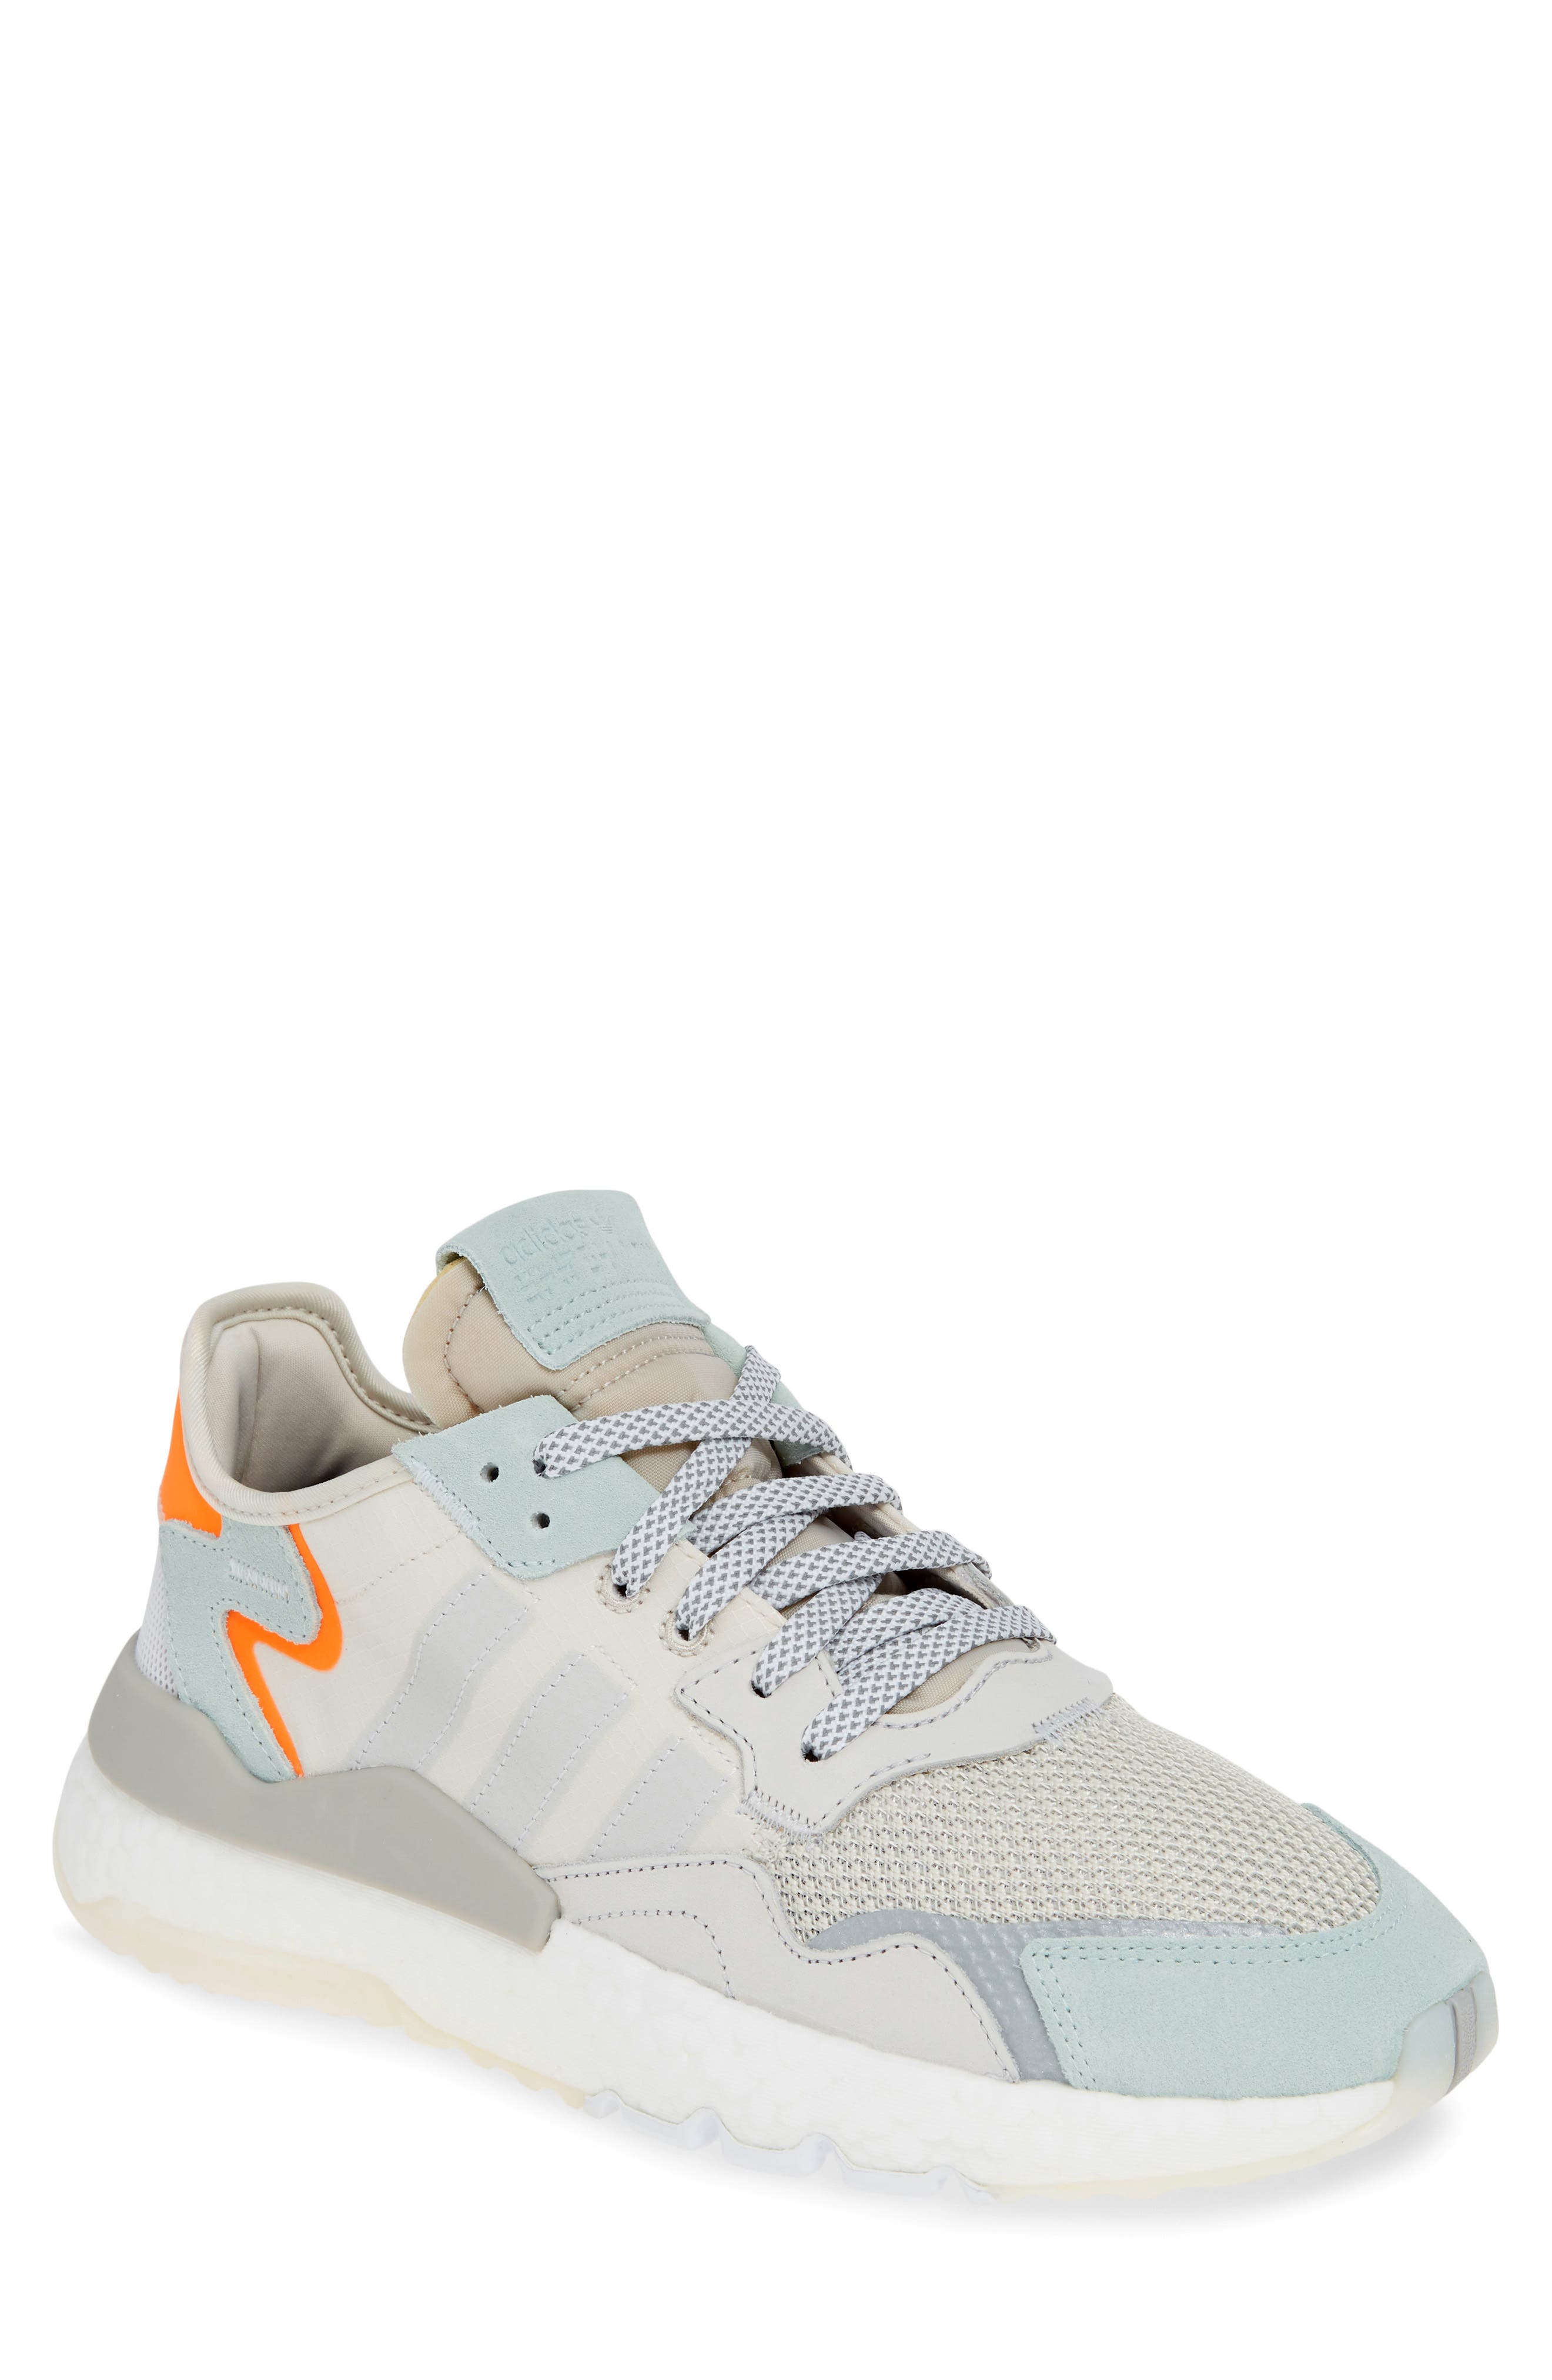 ADIDAS, Nite Jogger Sneaker, Main thumbnail 1, color, RAW WHITE/ GREY/ VAPOR GREEN